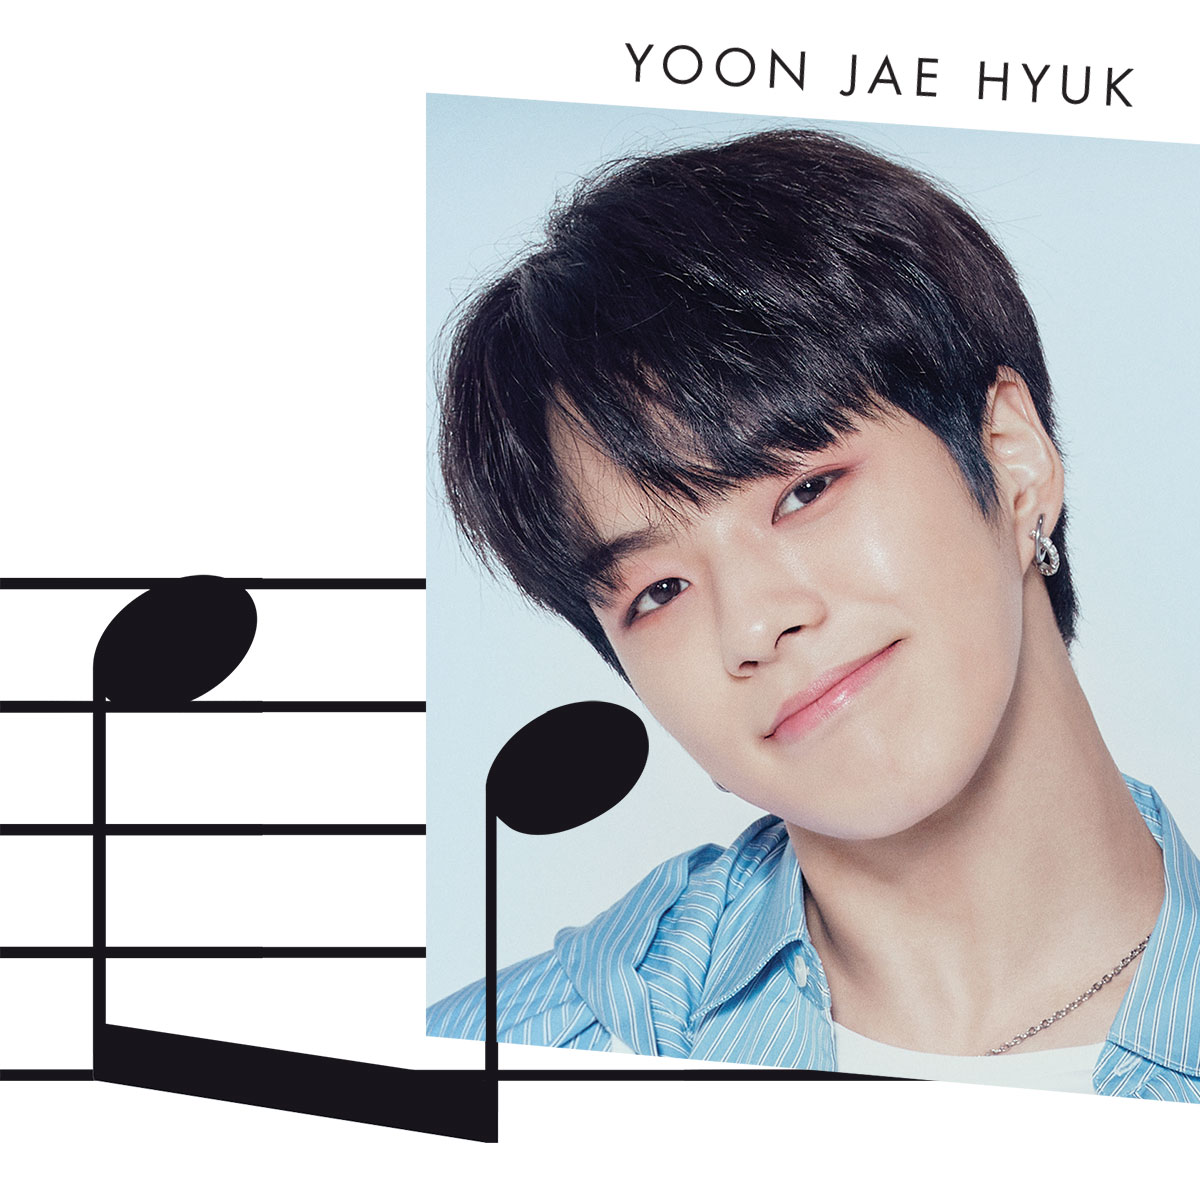 TREASURE YG Entertainment: Thế hệ mới của Kpop